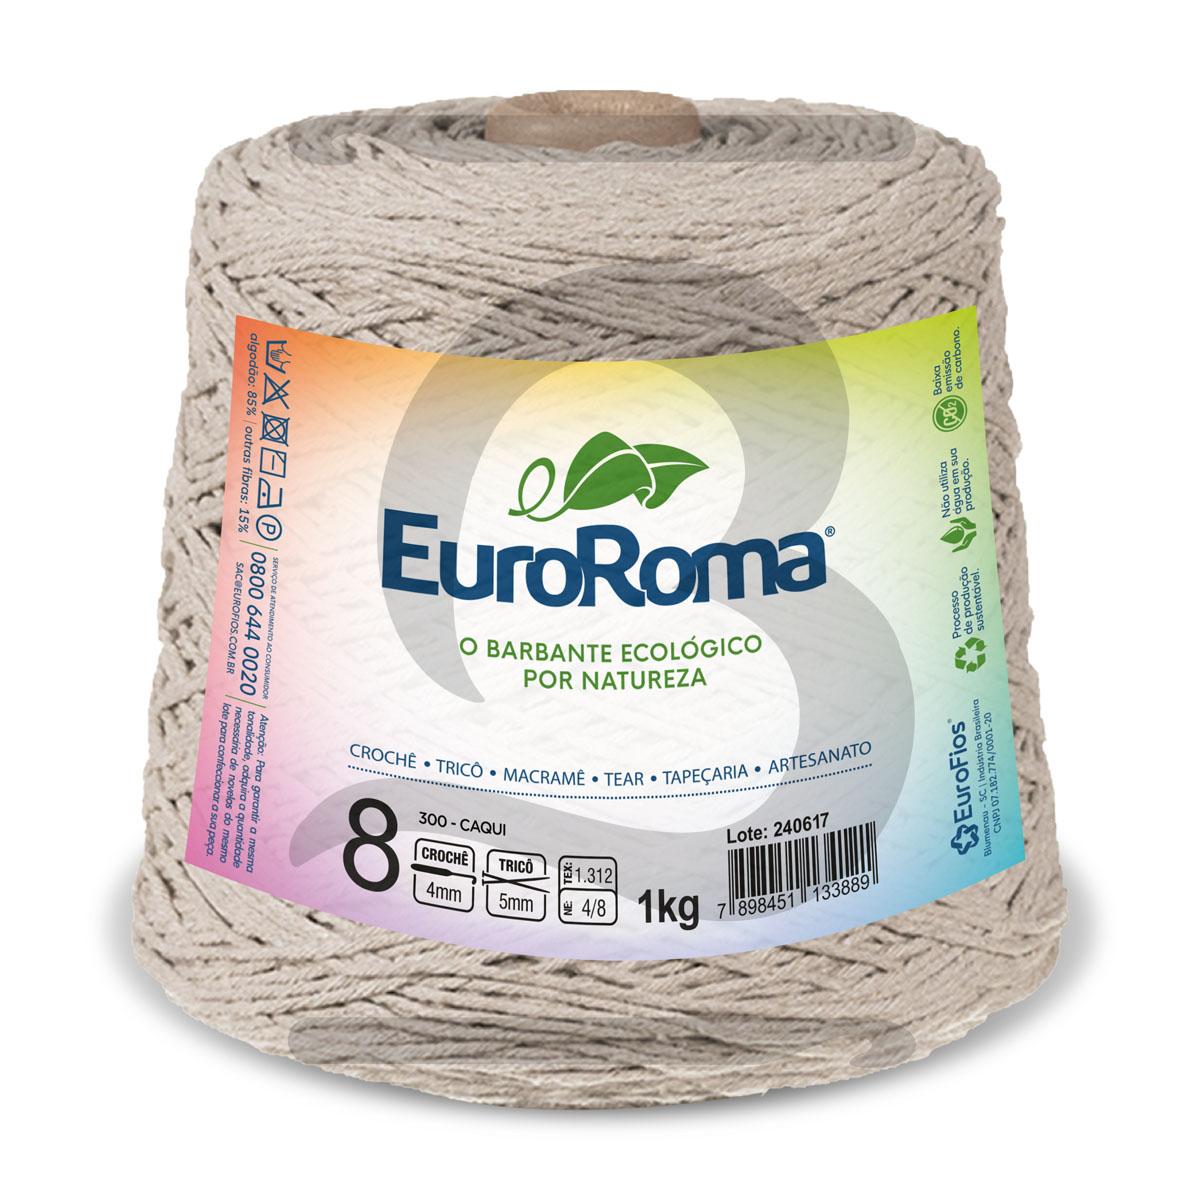 Barbante EuroRoma Colorido N°8 - 1kg Cor 300 Caqui